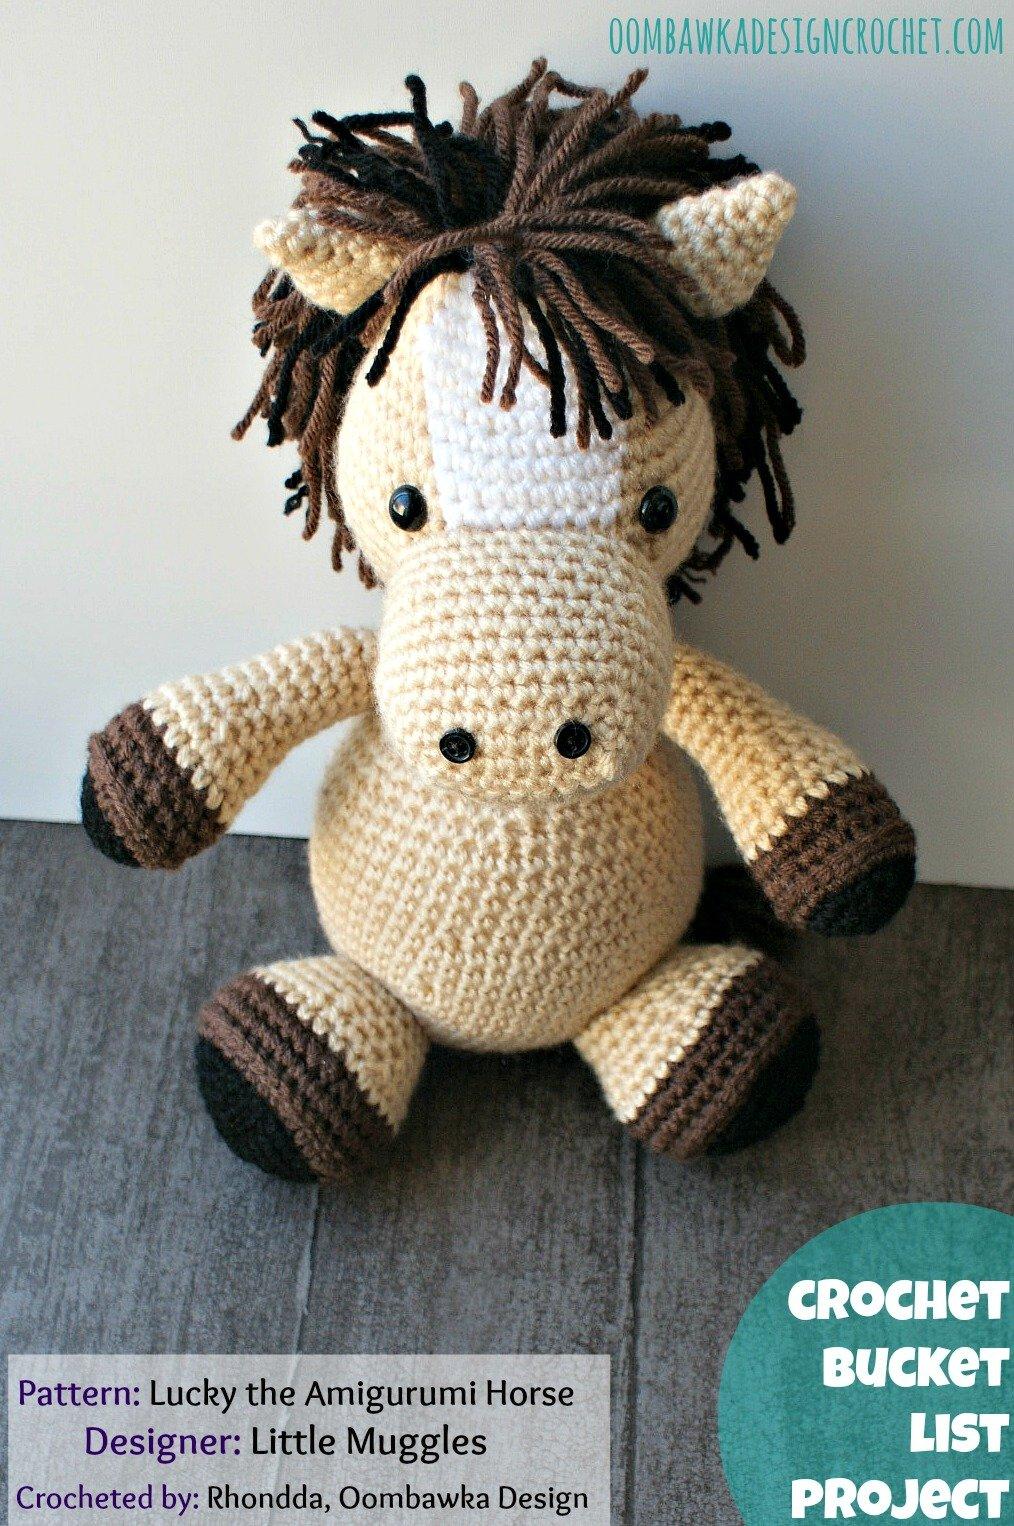 Free Crochet Pattern For Horse : Lucky the Amigurumi Horse Oombawka Design Crochet